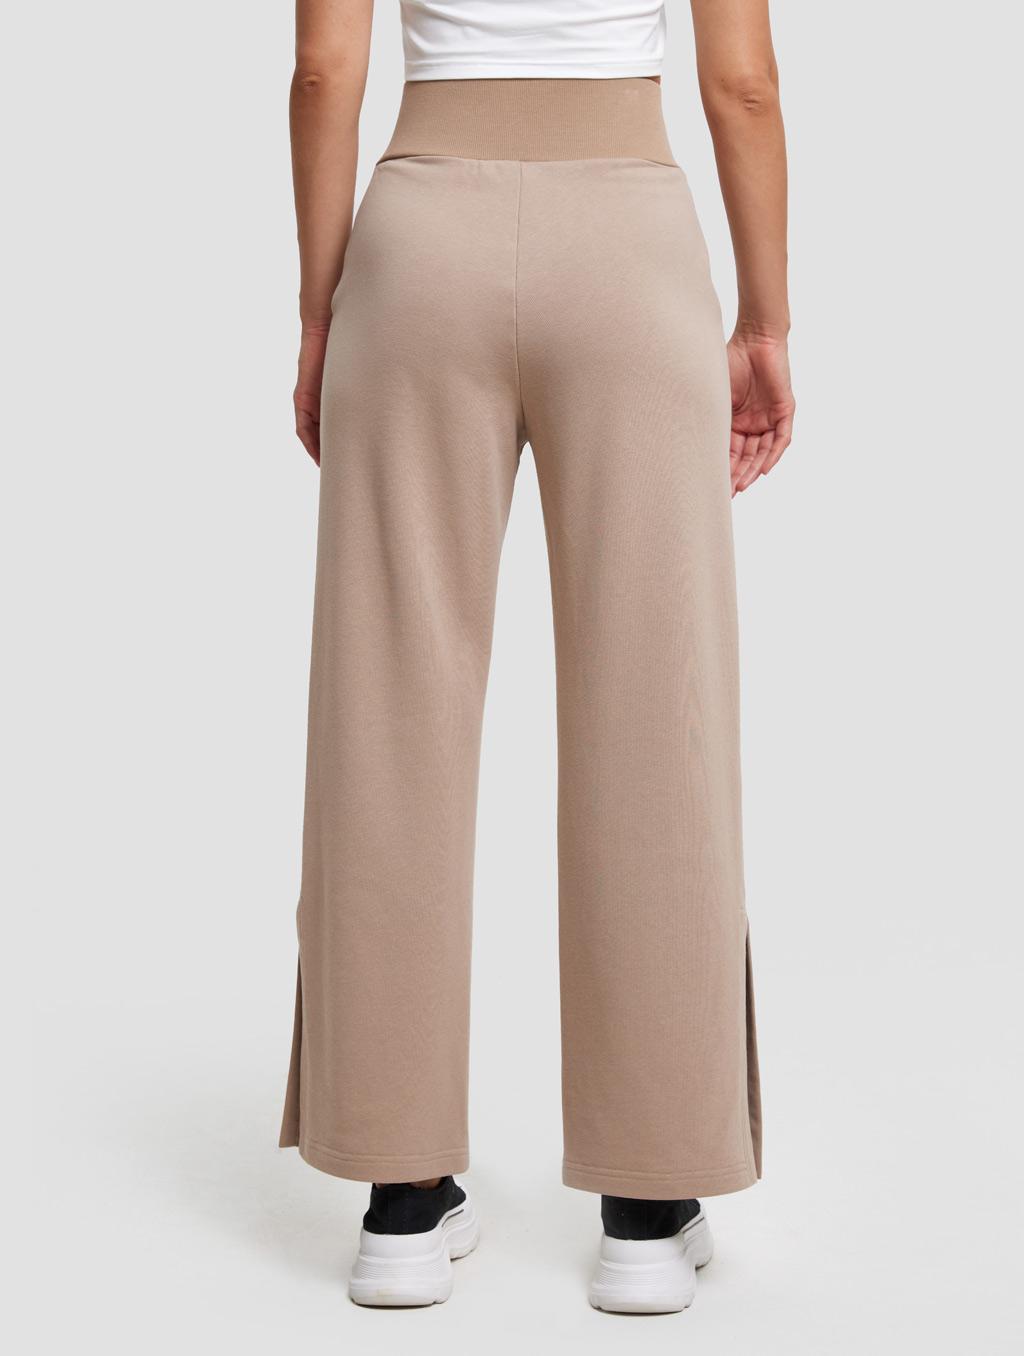 High-waist Threaded Slit Sweatpant-back-Caramel